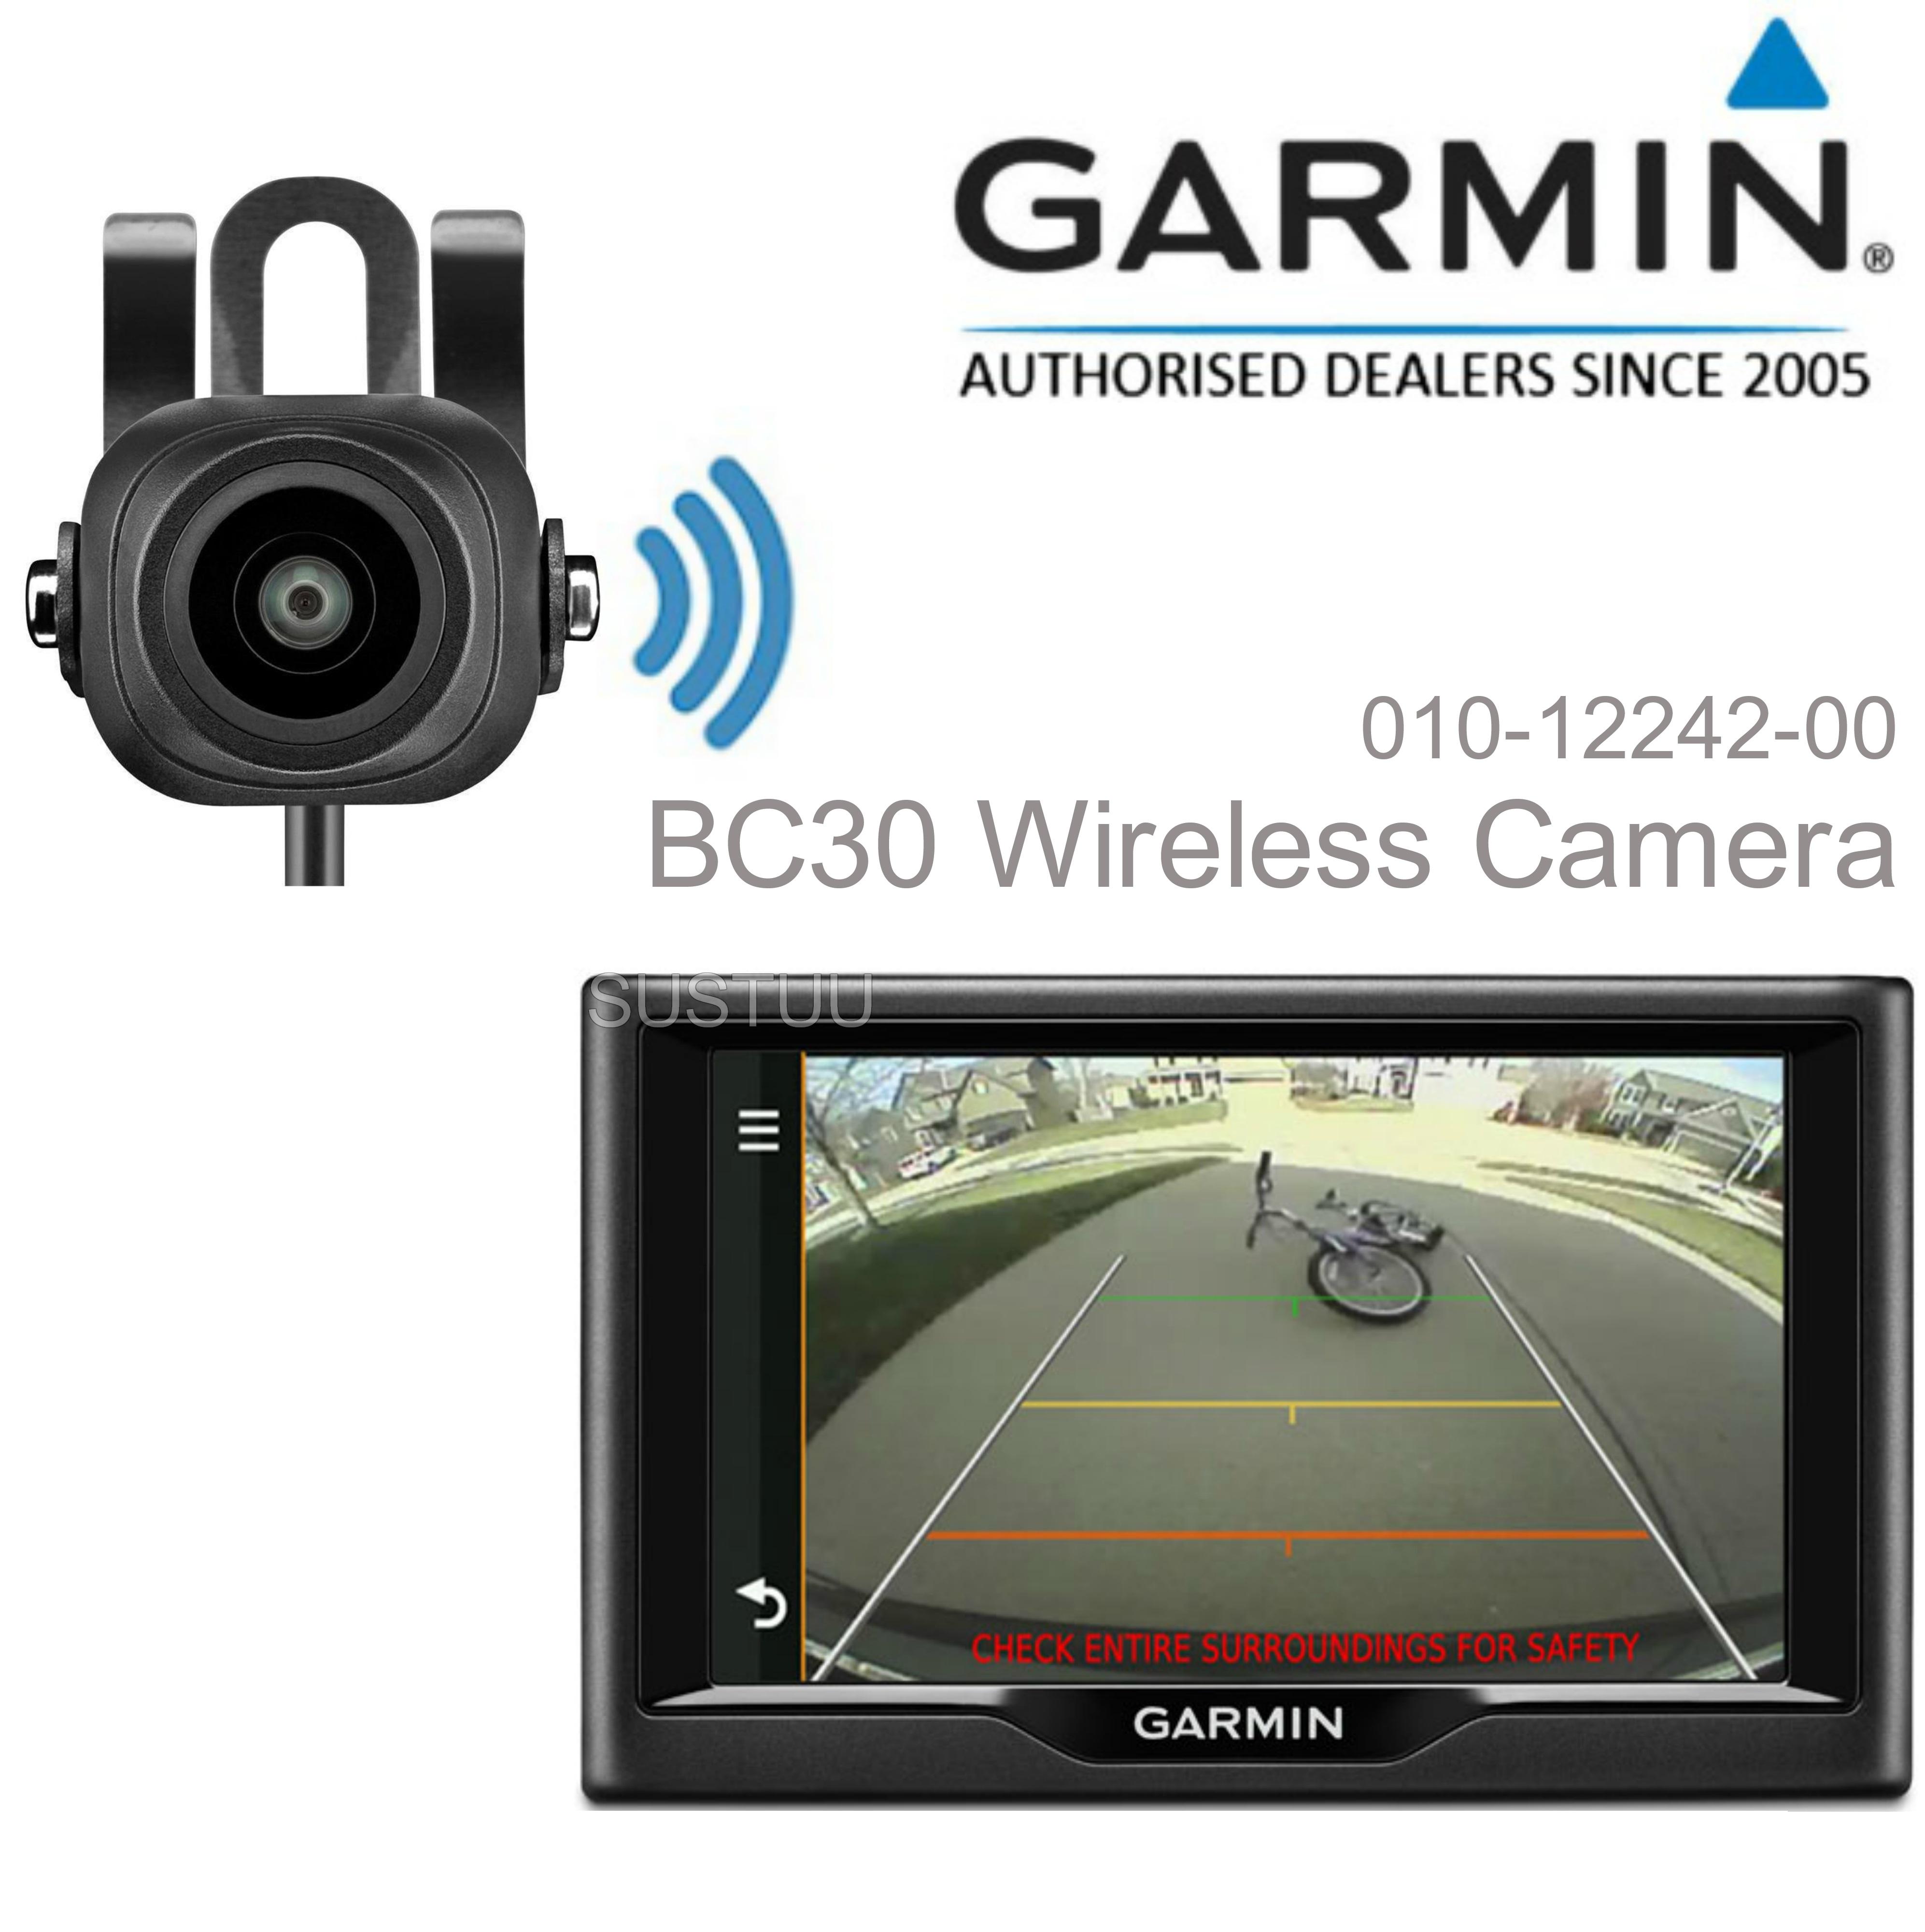 Garmin BC30 Wireless Reverse/ Parking Backup Camera | For Nuvi-Dezl/Truck-Camper